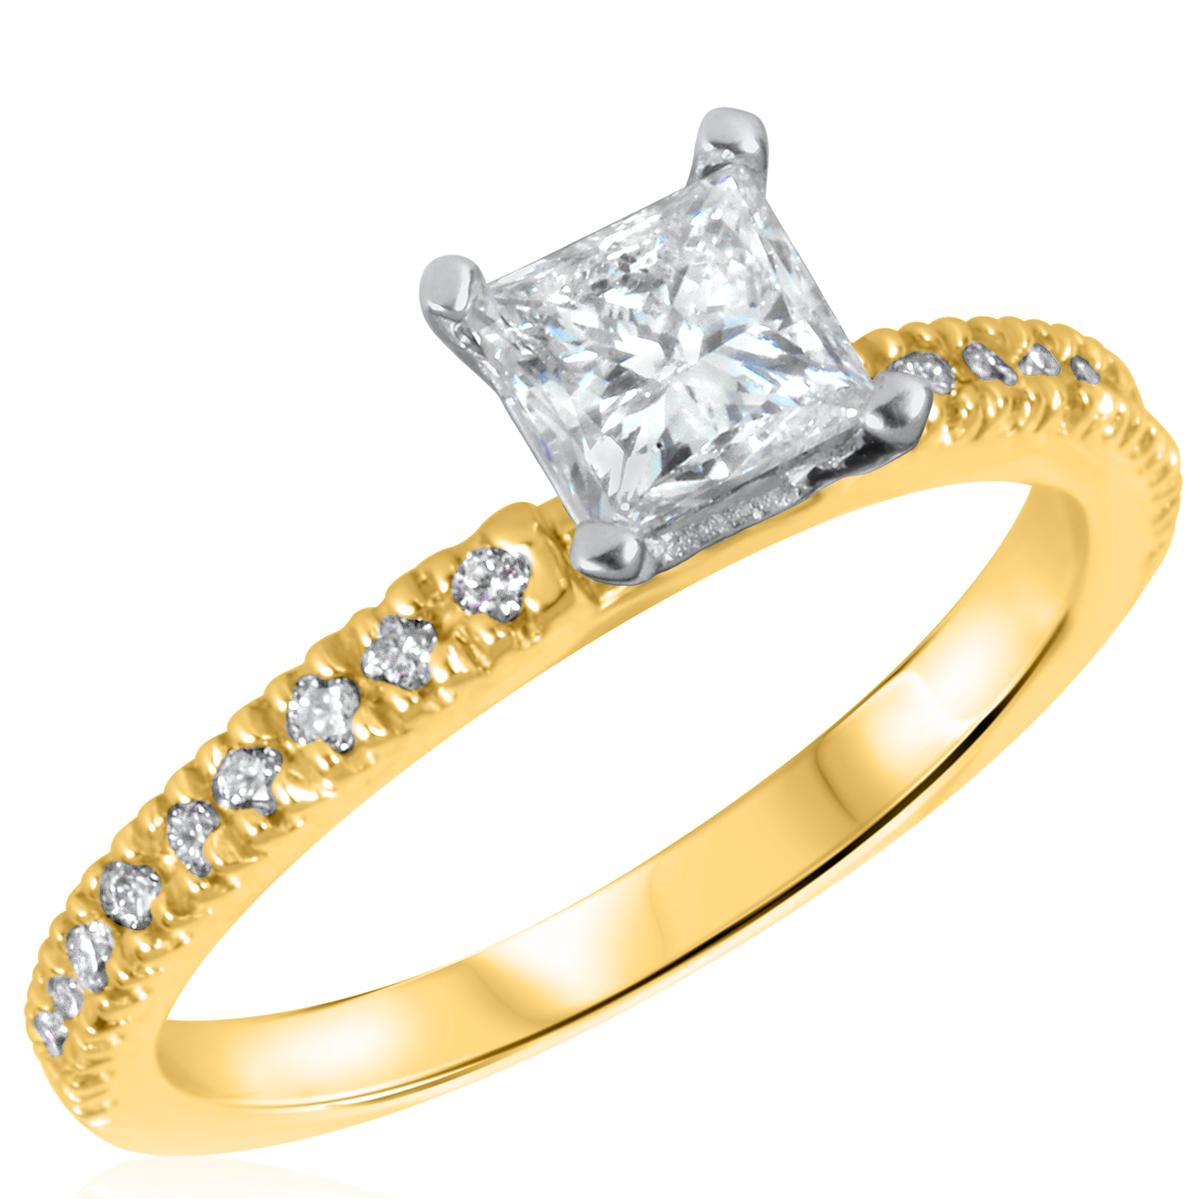 1 CT. T.W. Diamond Ladies Engagement Ring 10K Yellow Gold- Size 8